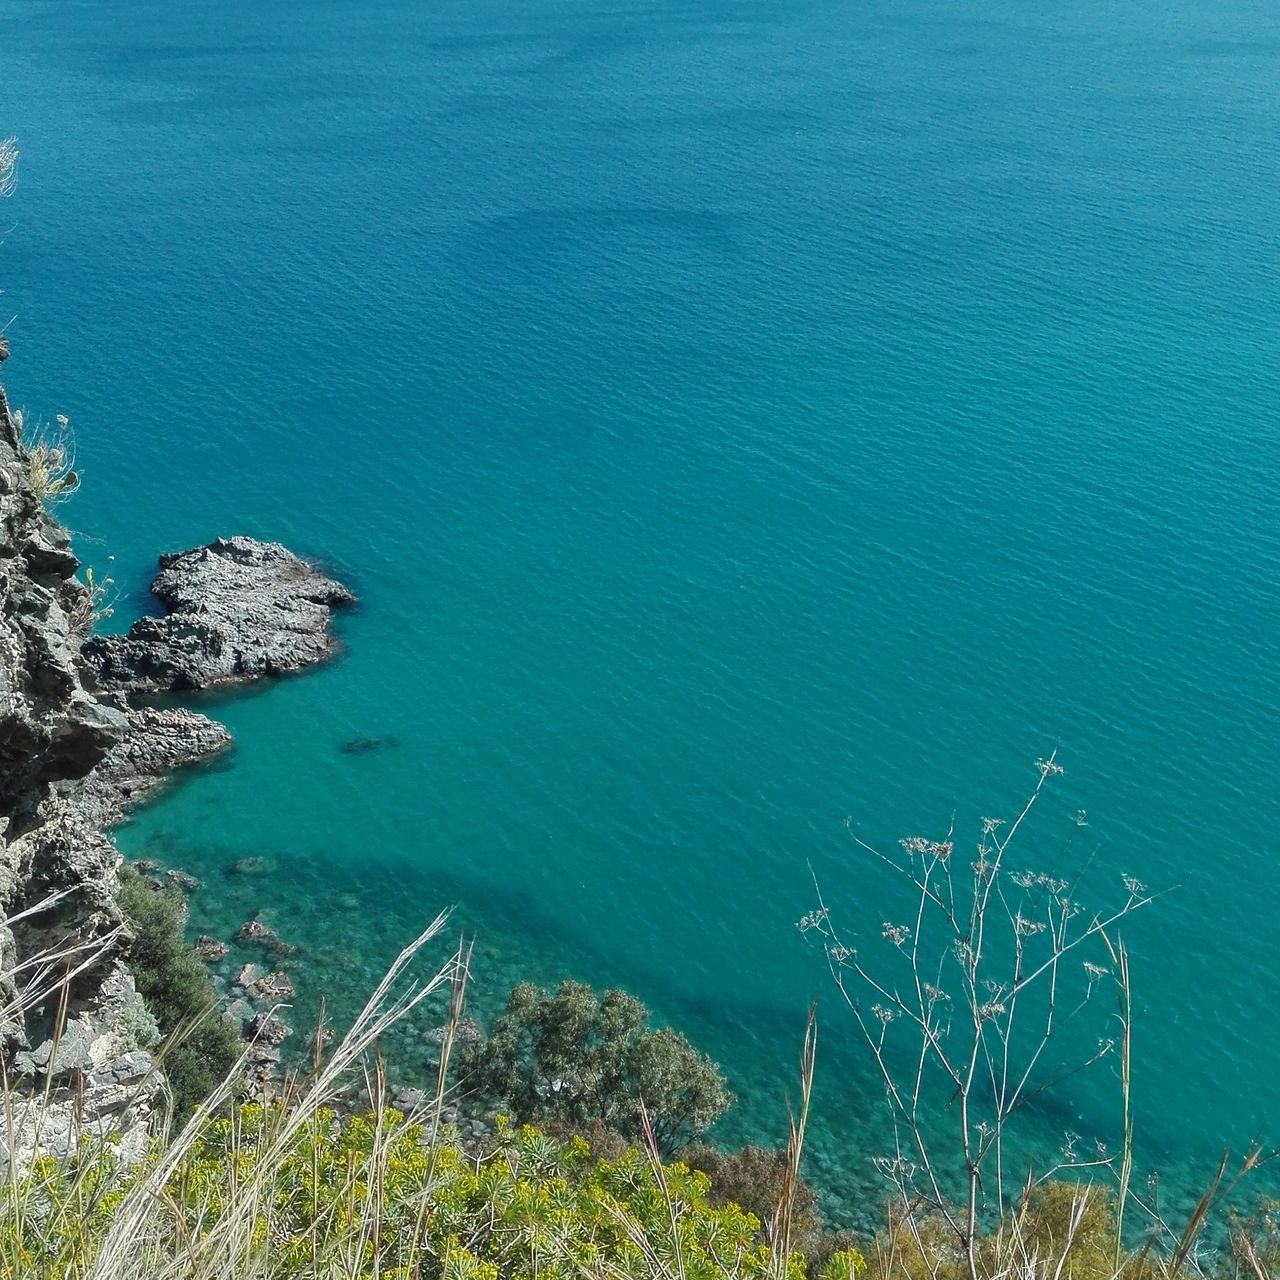 Calabria bella, Copanello (cz) Nature Tranquility Taking Photos Calabria South Italy Calabria (Italy) Calabriadaamare Calabriadascoprire Calabriabella Calabriastateofmind Sea View Mare Di Calabria Mare ❤ Outdoors Mare Azzurro Nonveniteincalabria Blue Sea